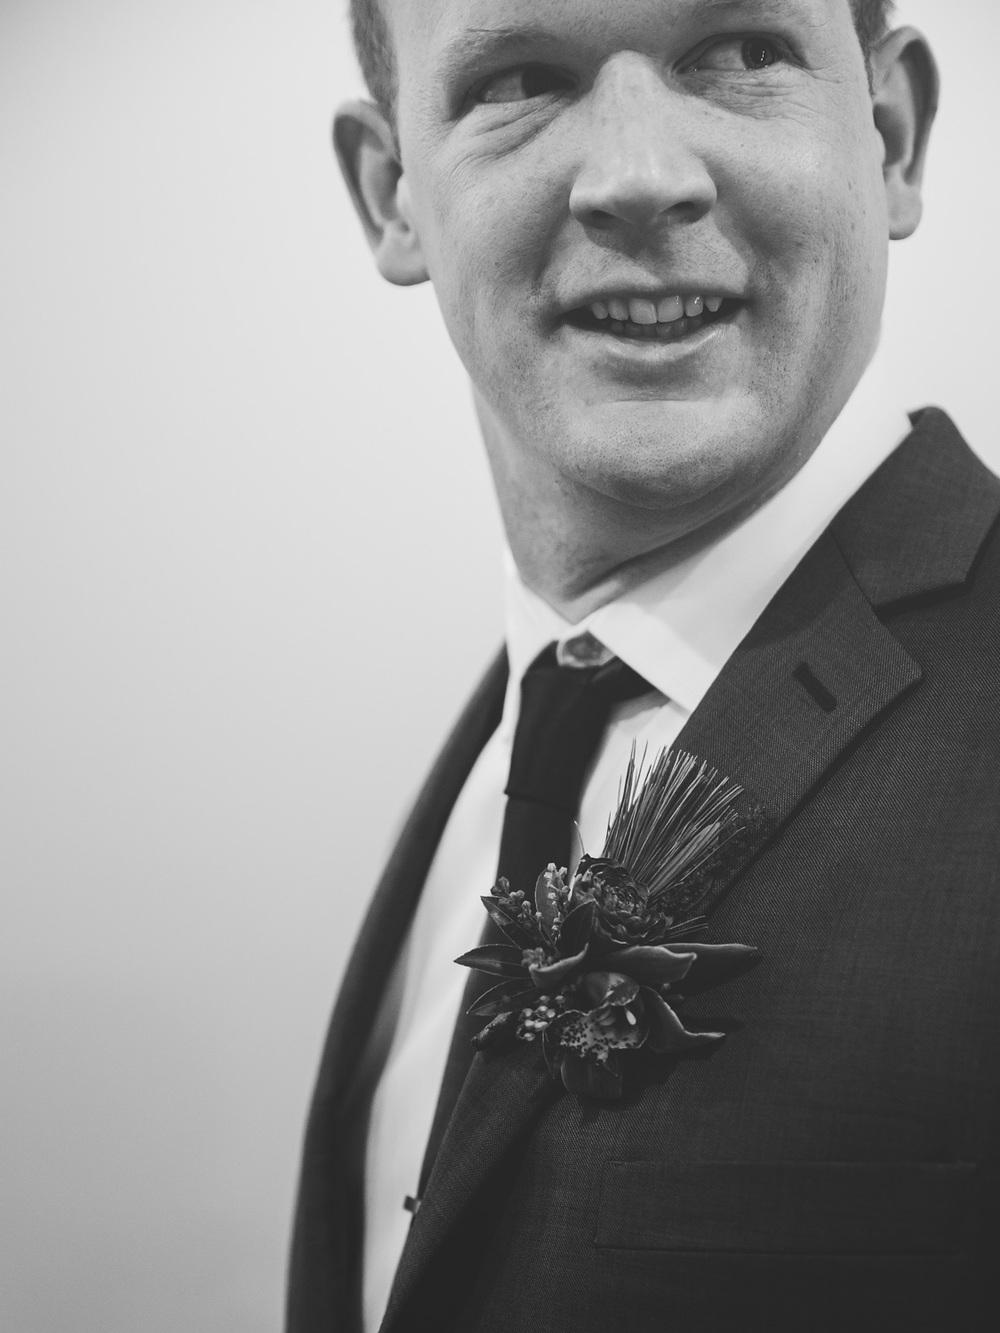 jordan-mike-wedding-010-blog.jpg